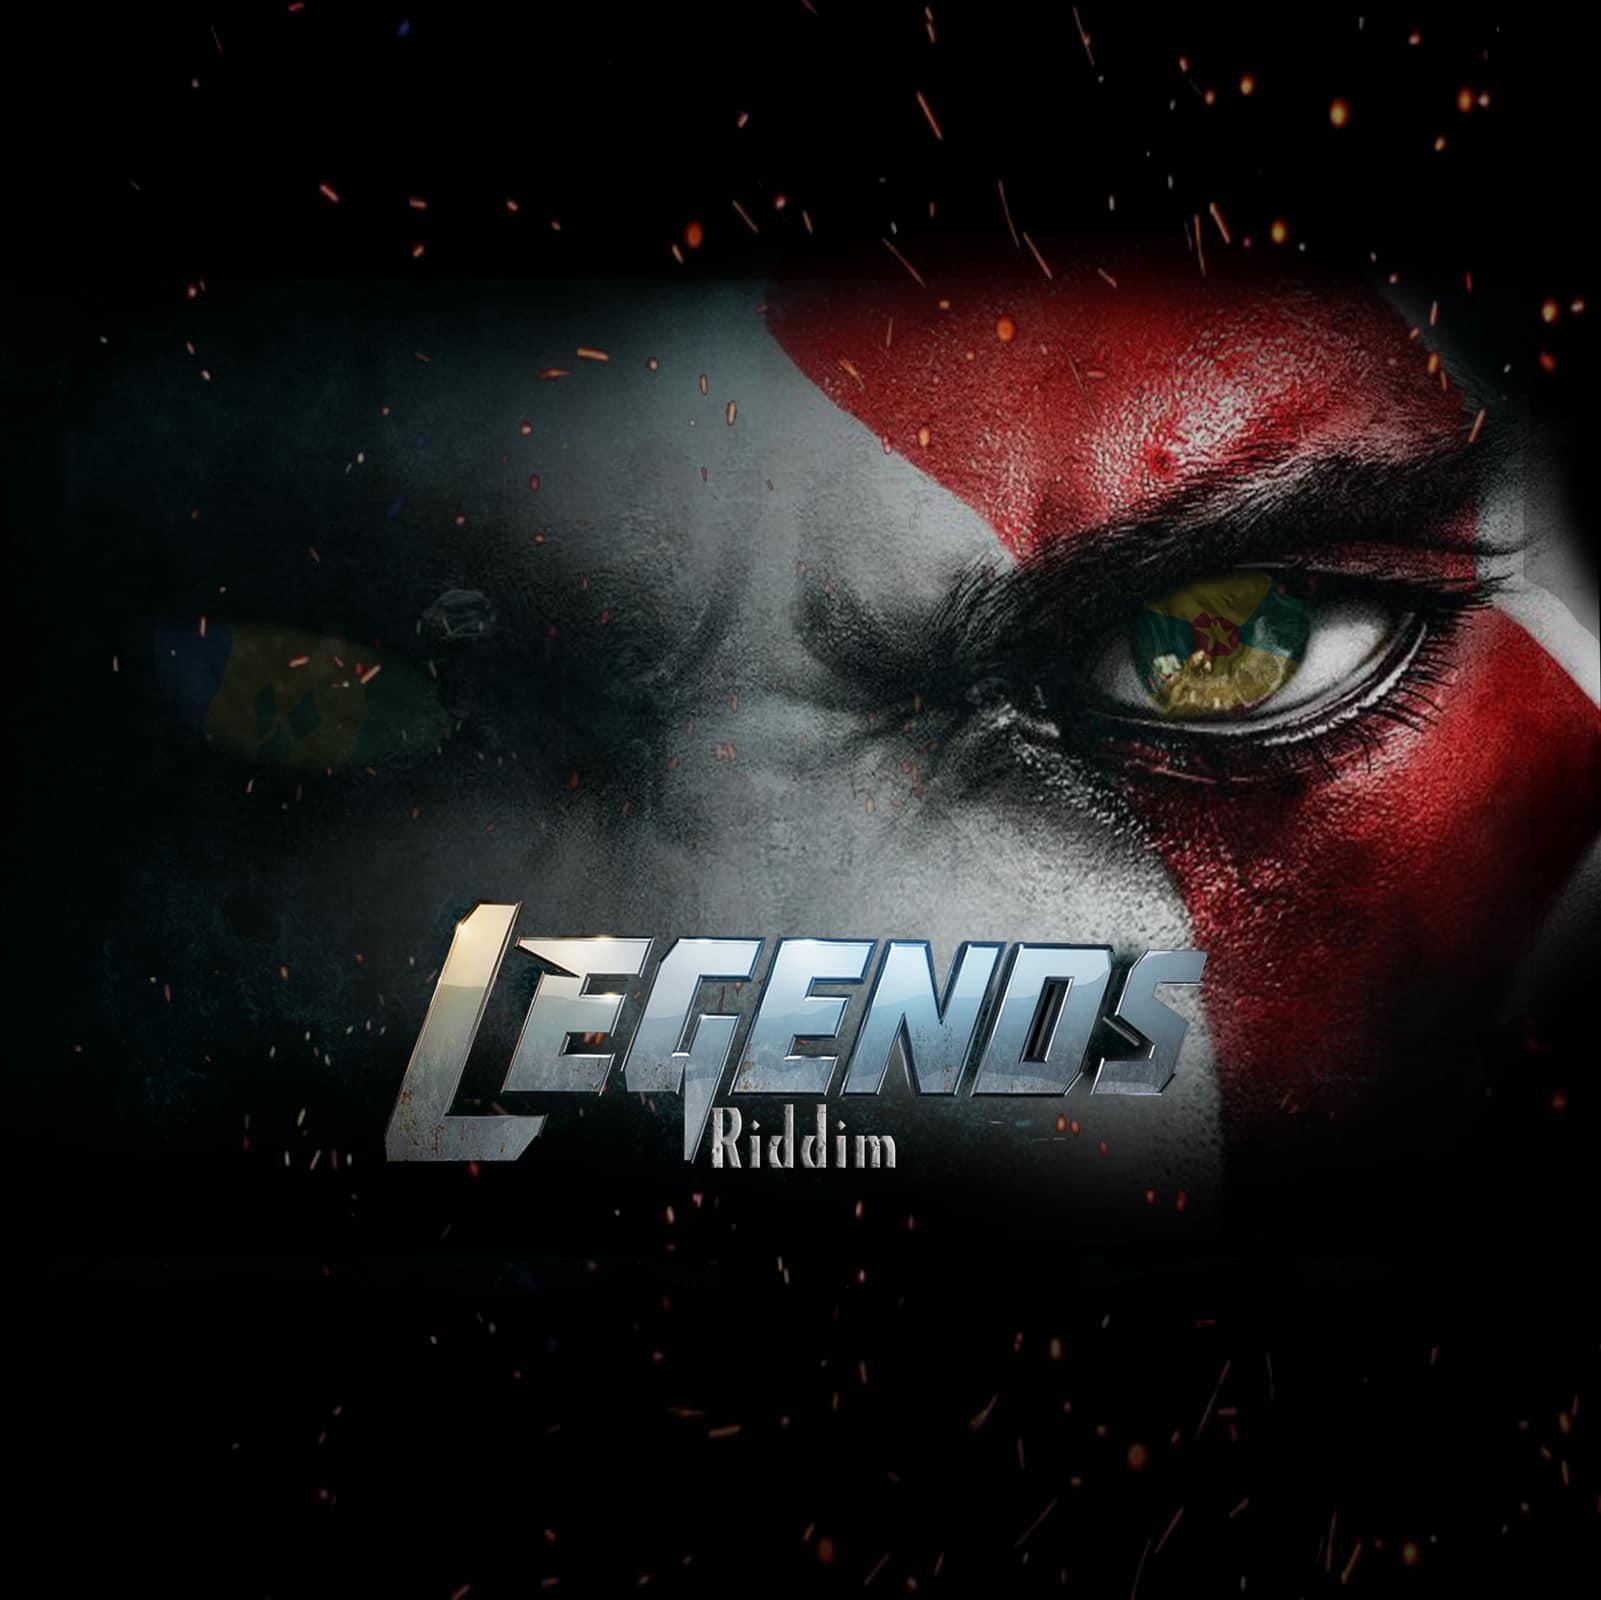 Legends Riddim